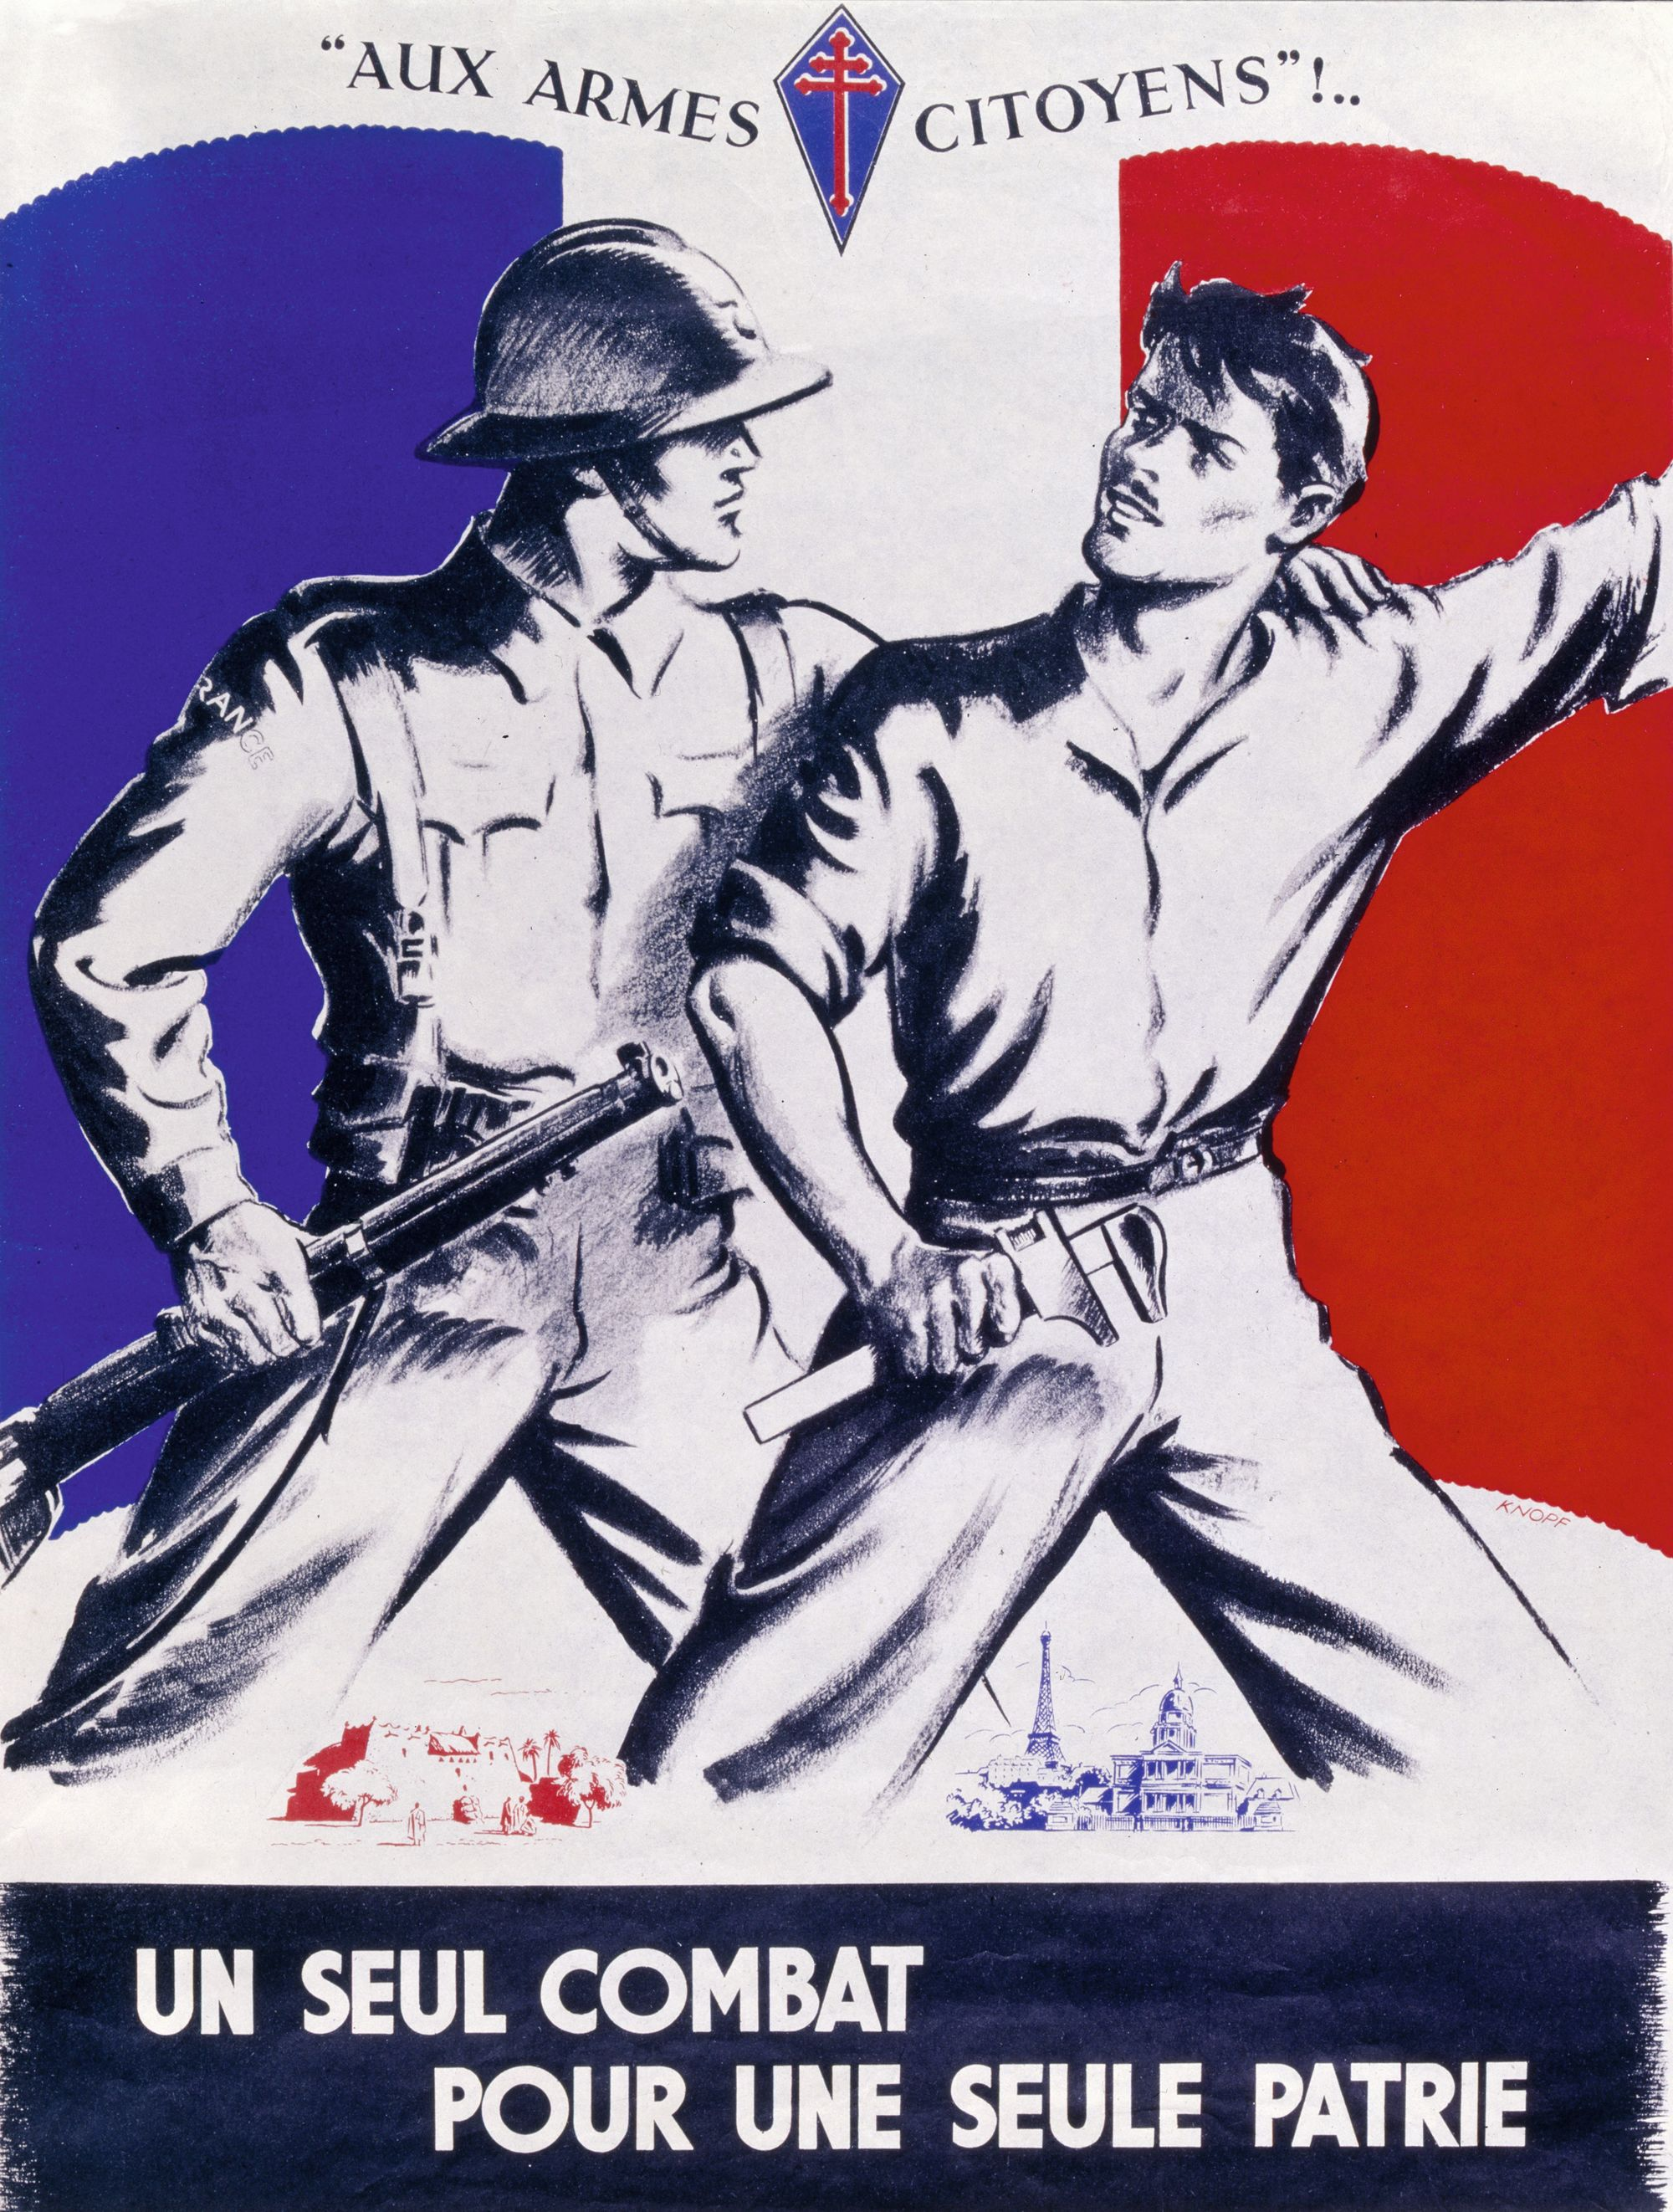 Dossier 4 Un Seul Combat Rallier la population